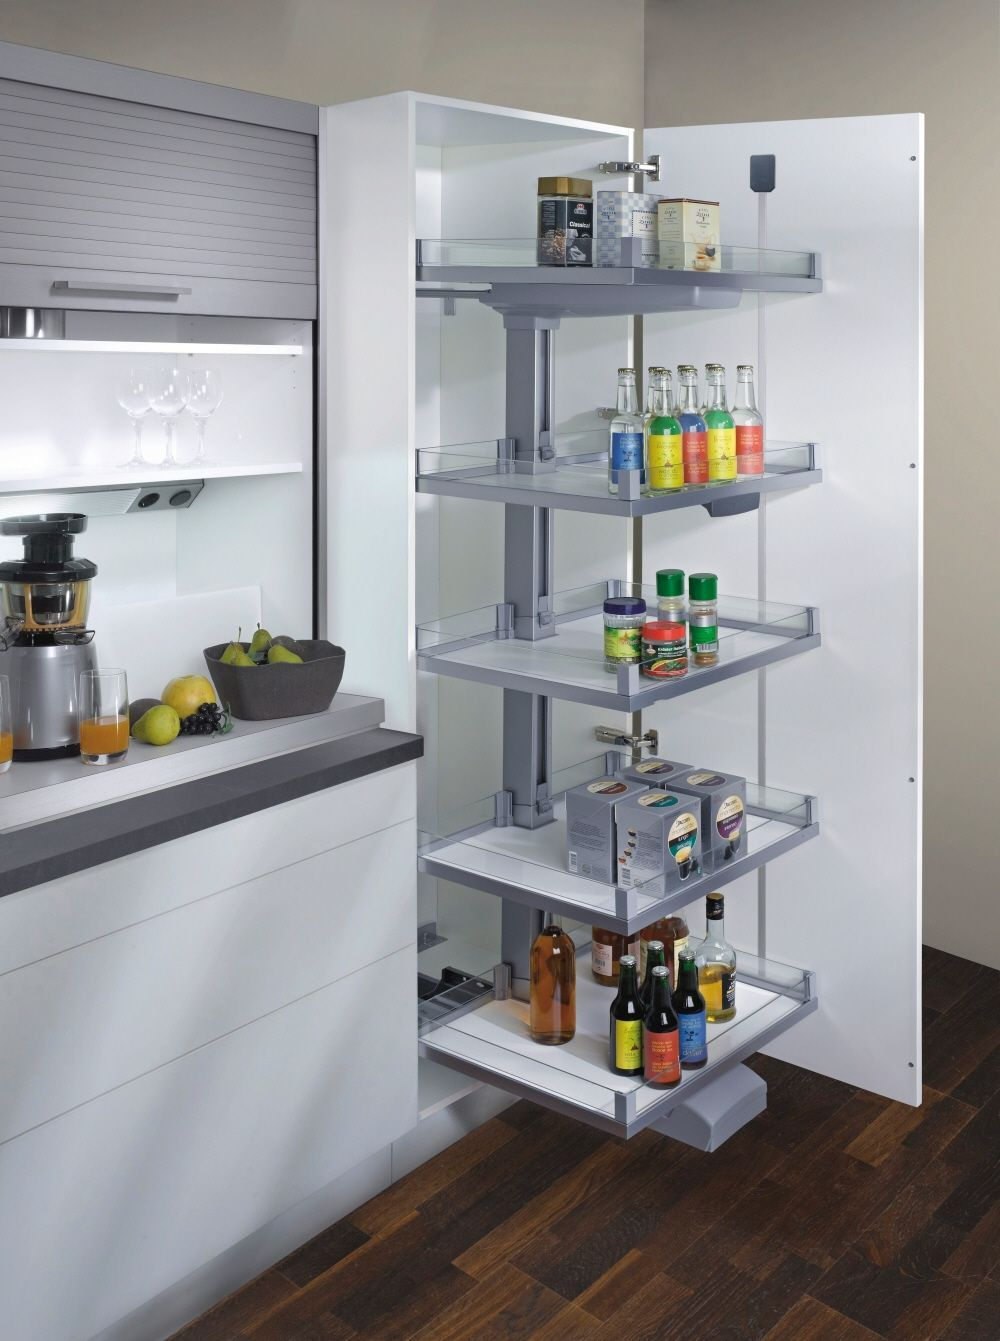 Eckschrank Küche Auszug – wotzc moebel  HWR  Pinterest